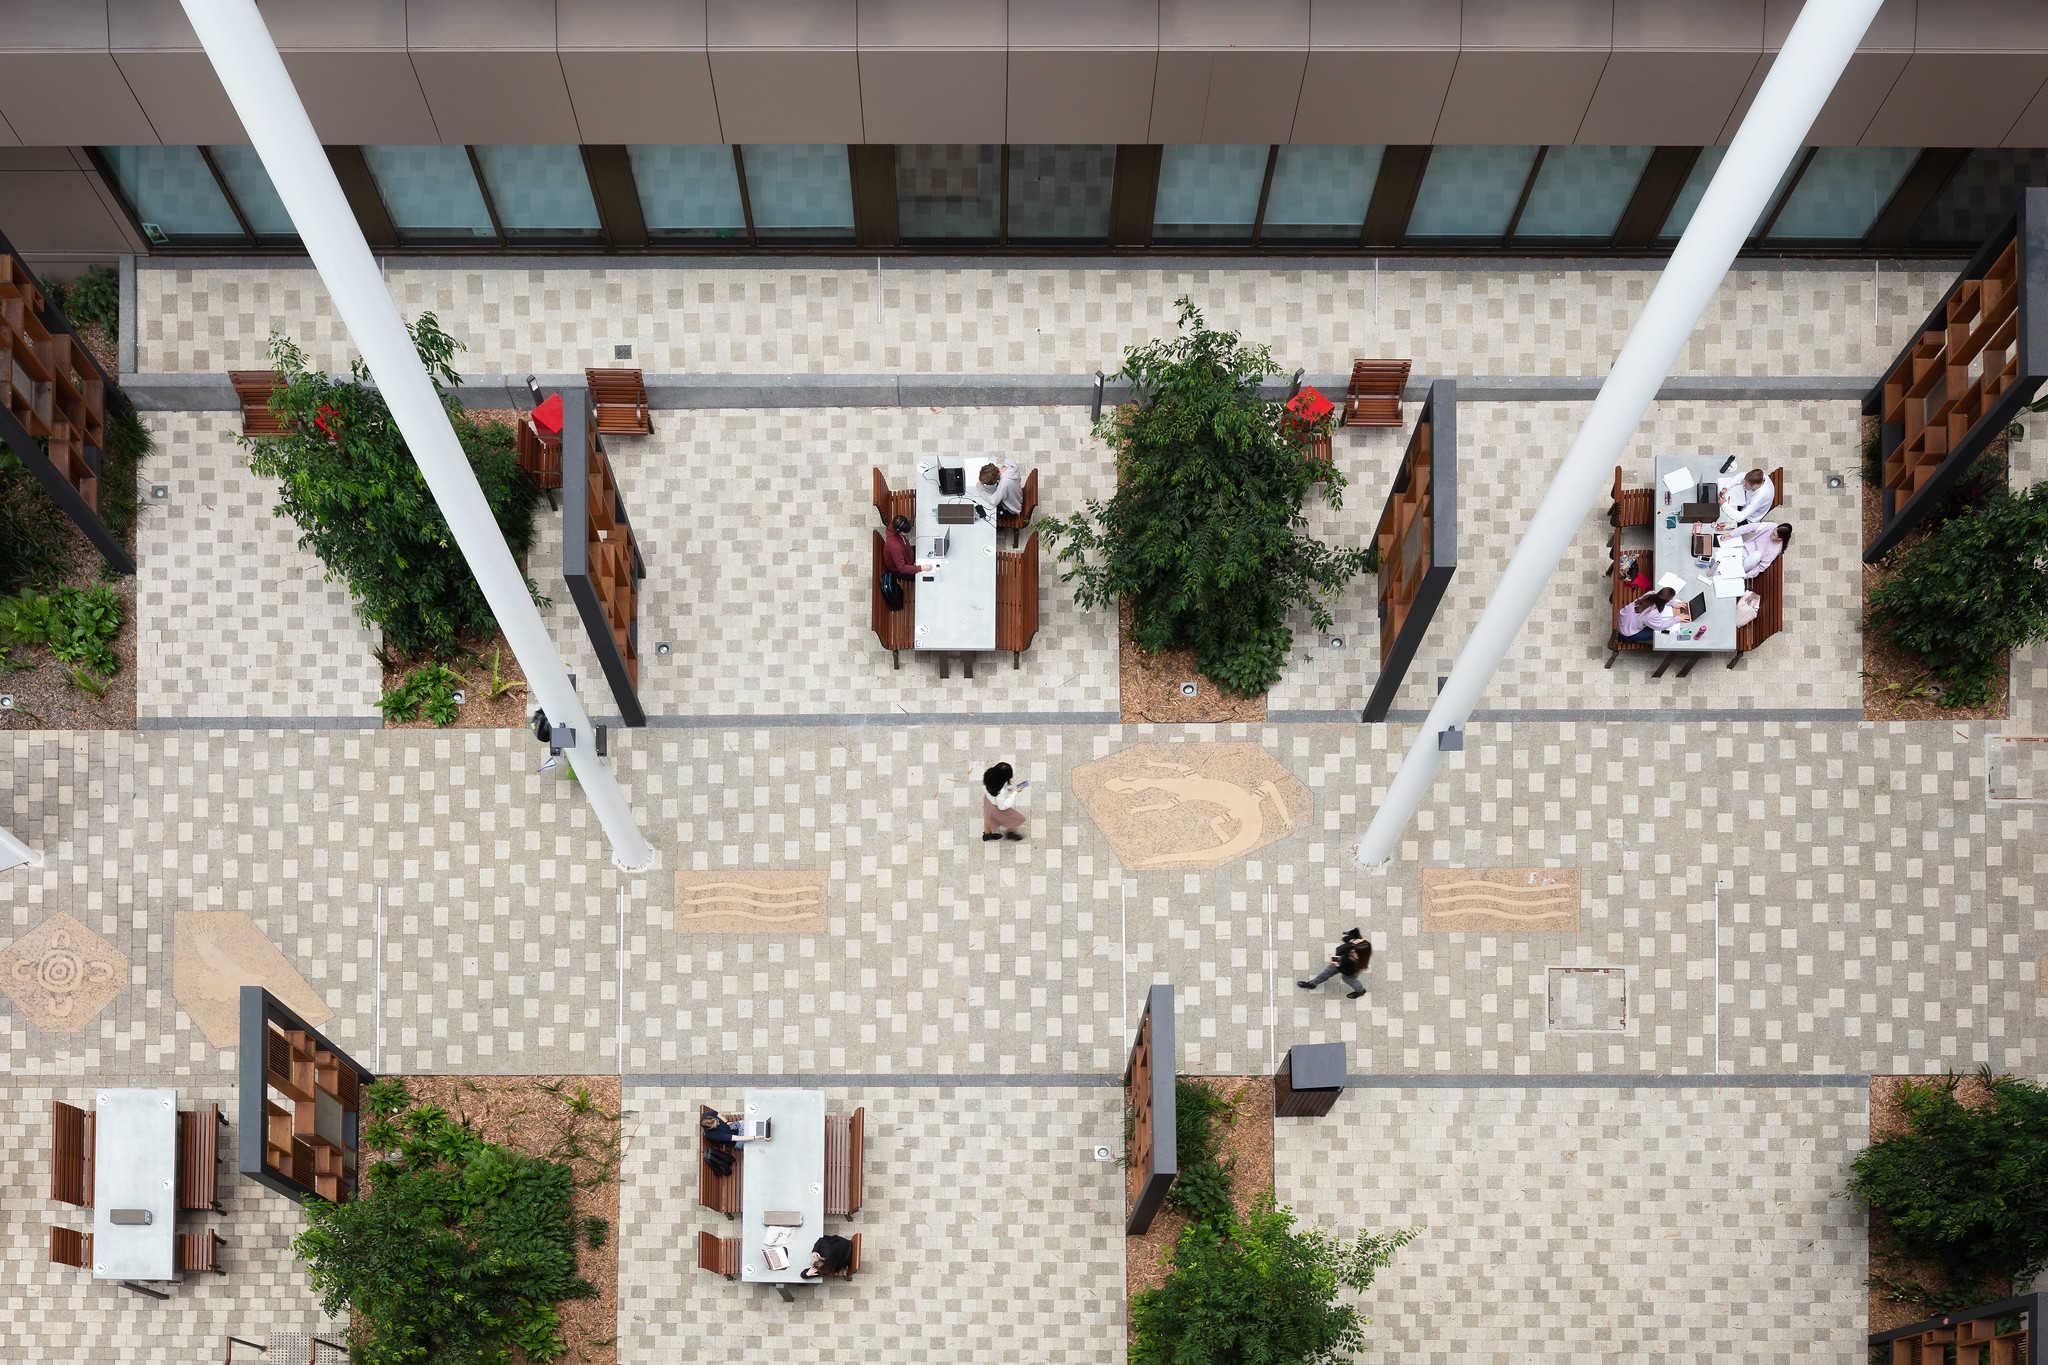 Macquarie University Arts Precinct